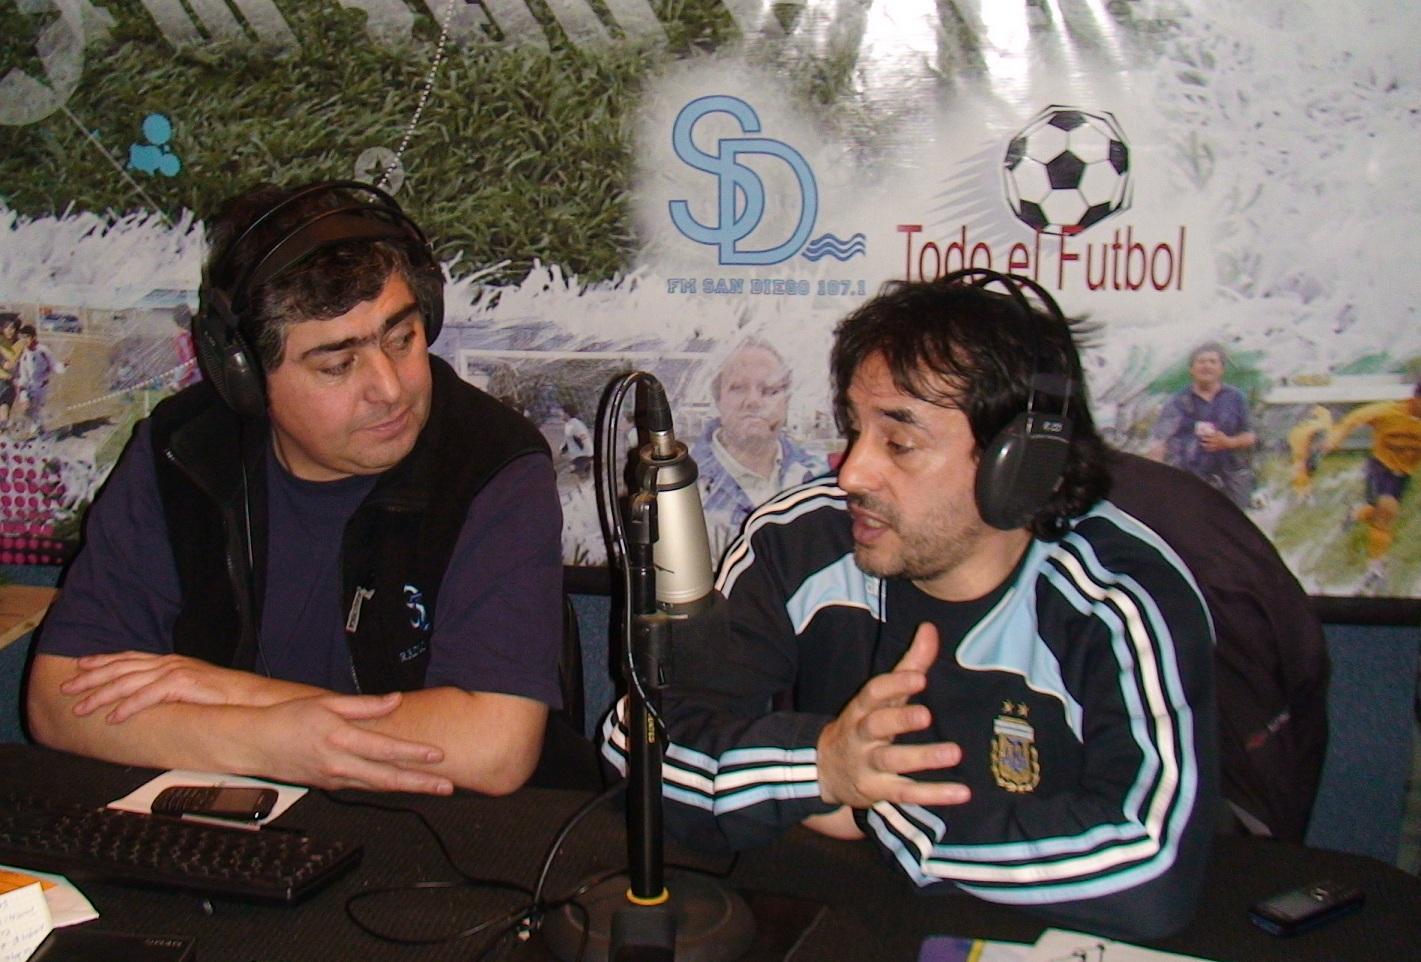 RADIO SAN DIEGO: julio 2012